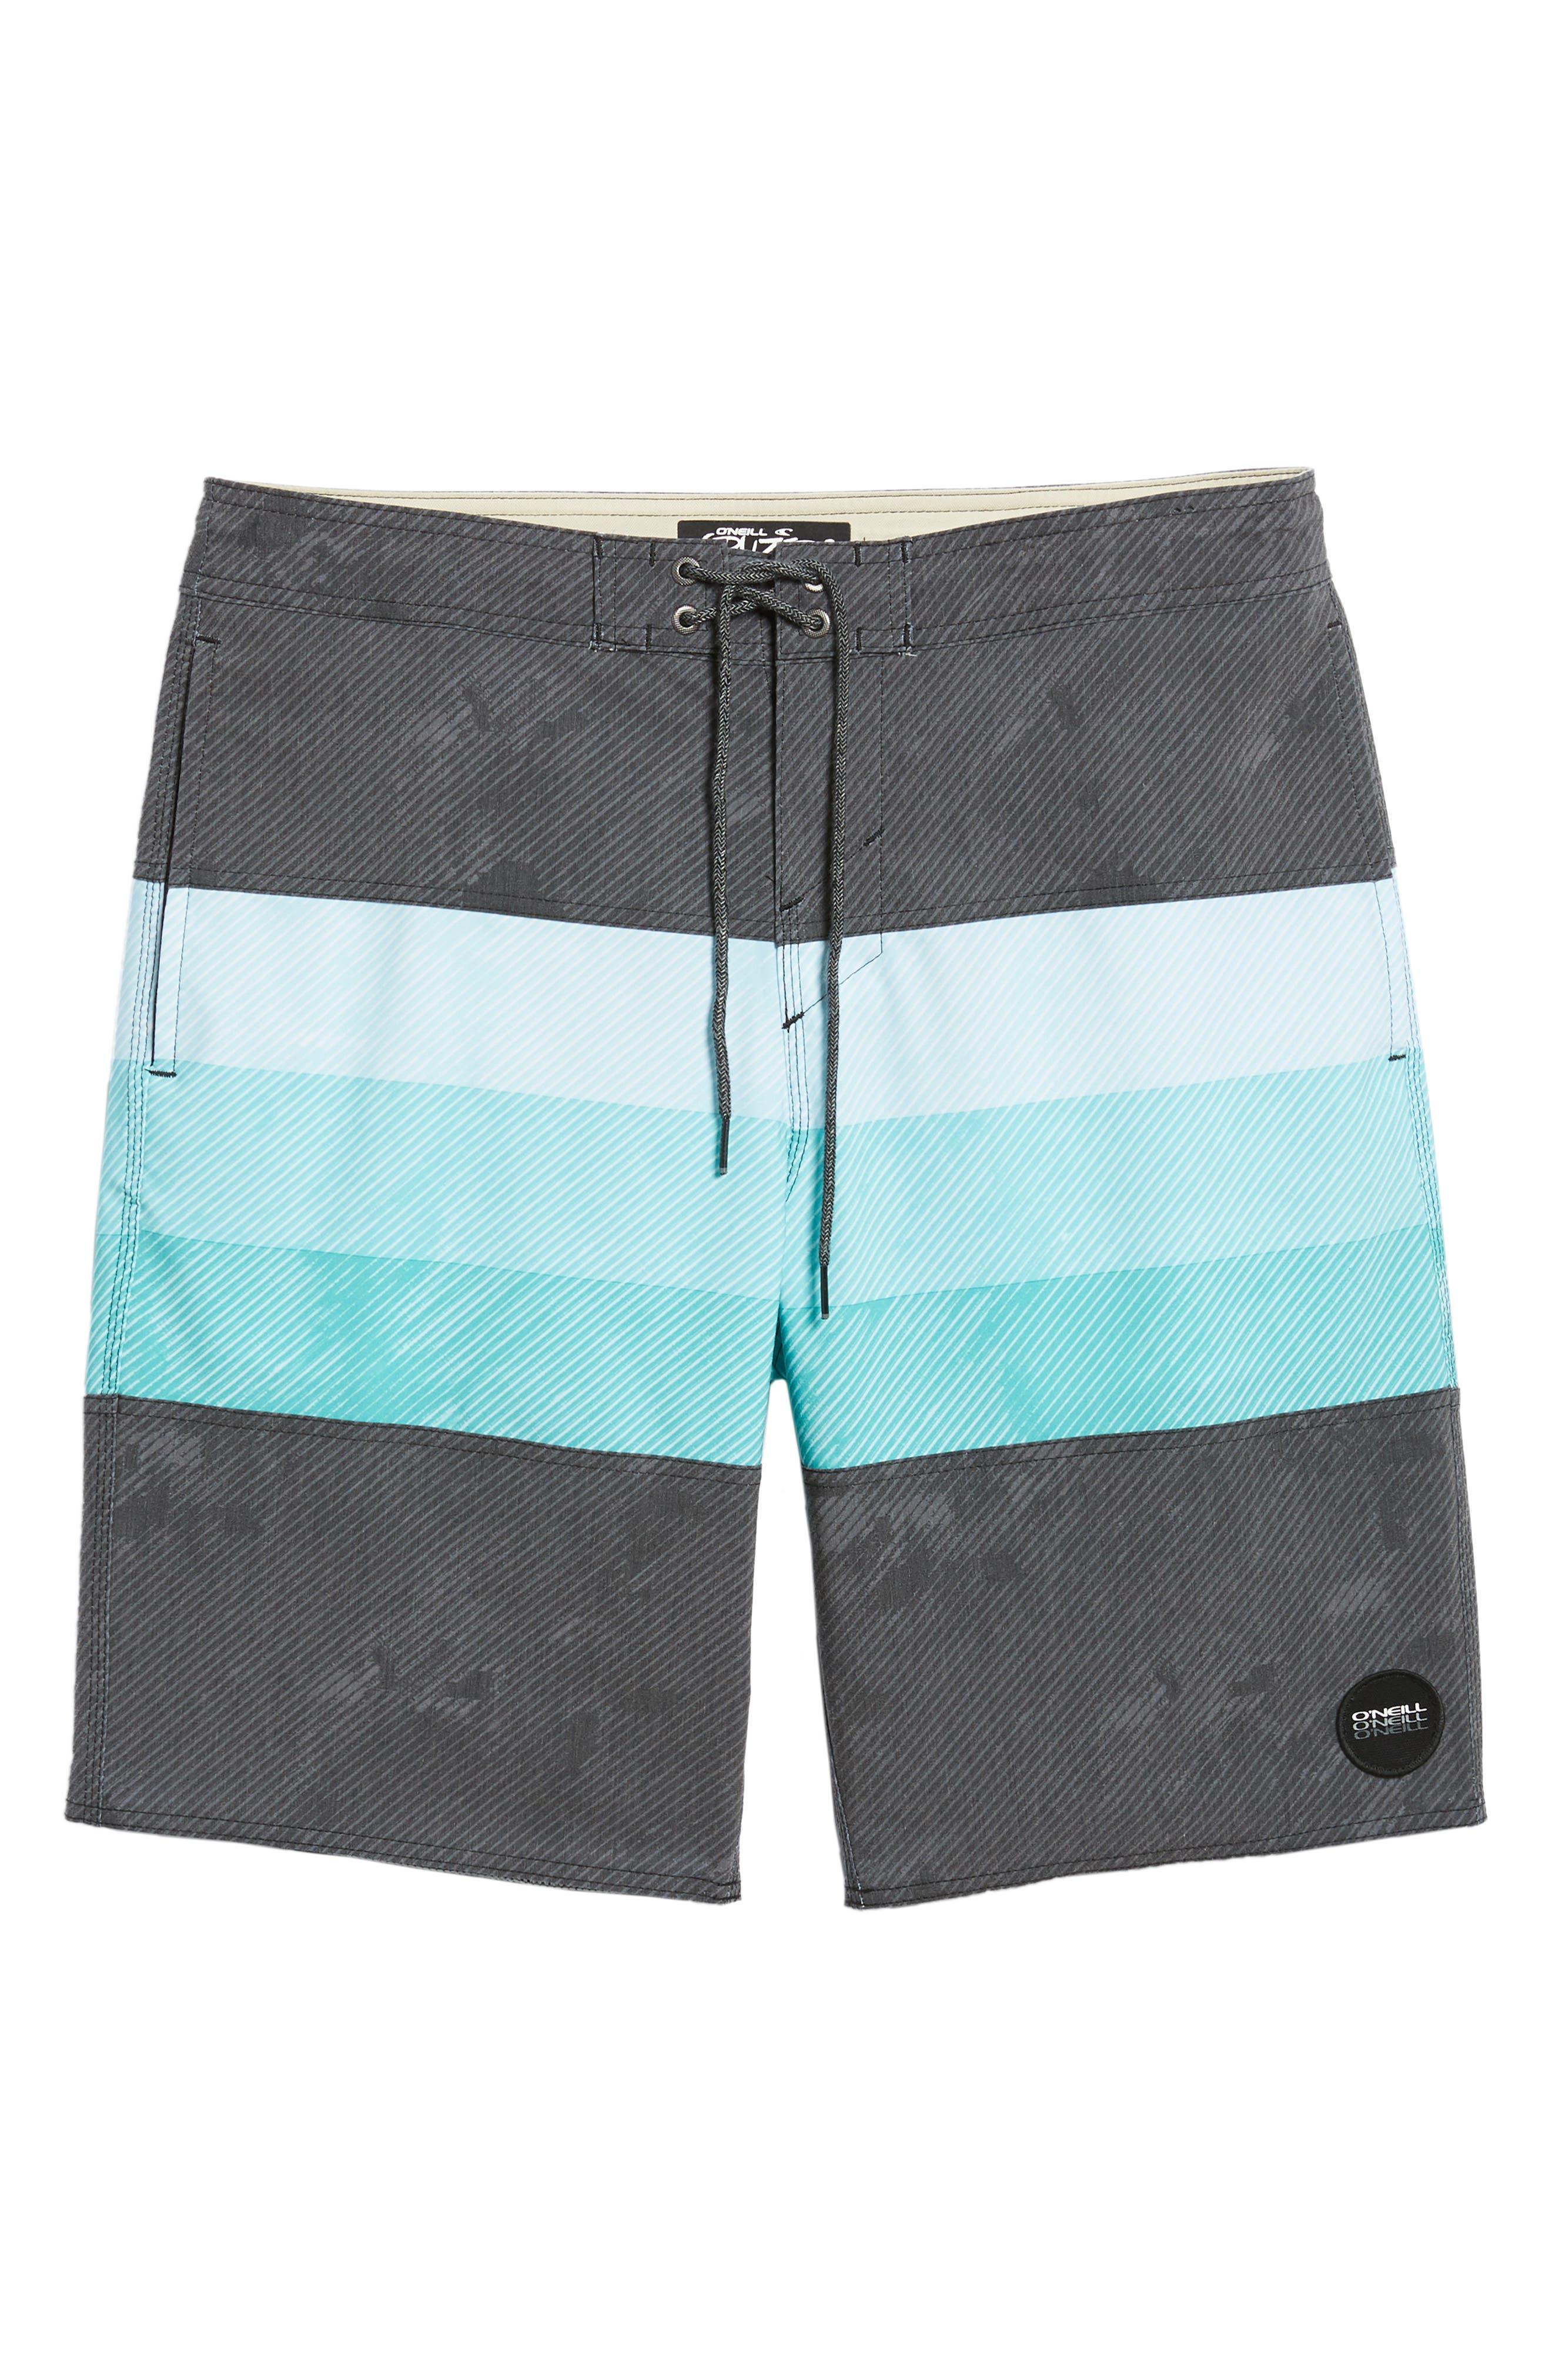 Region Cruzer Board Shorts,                             Alternate thumbnail 6, color,                             Black